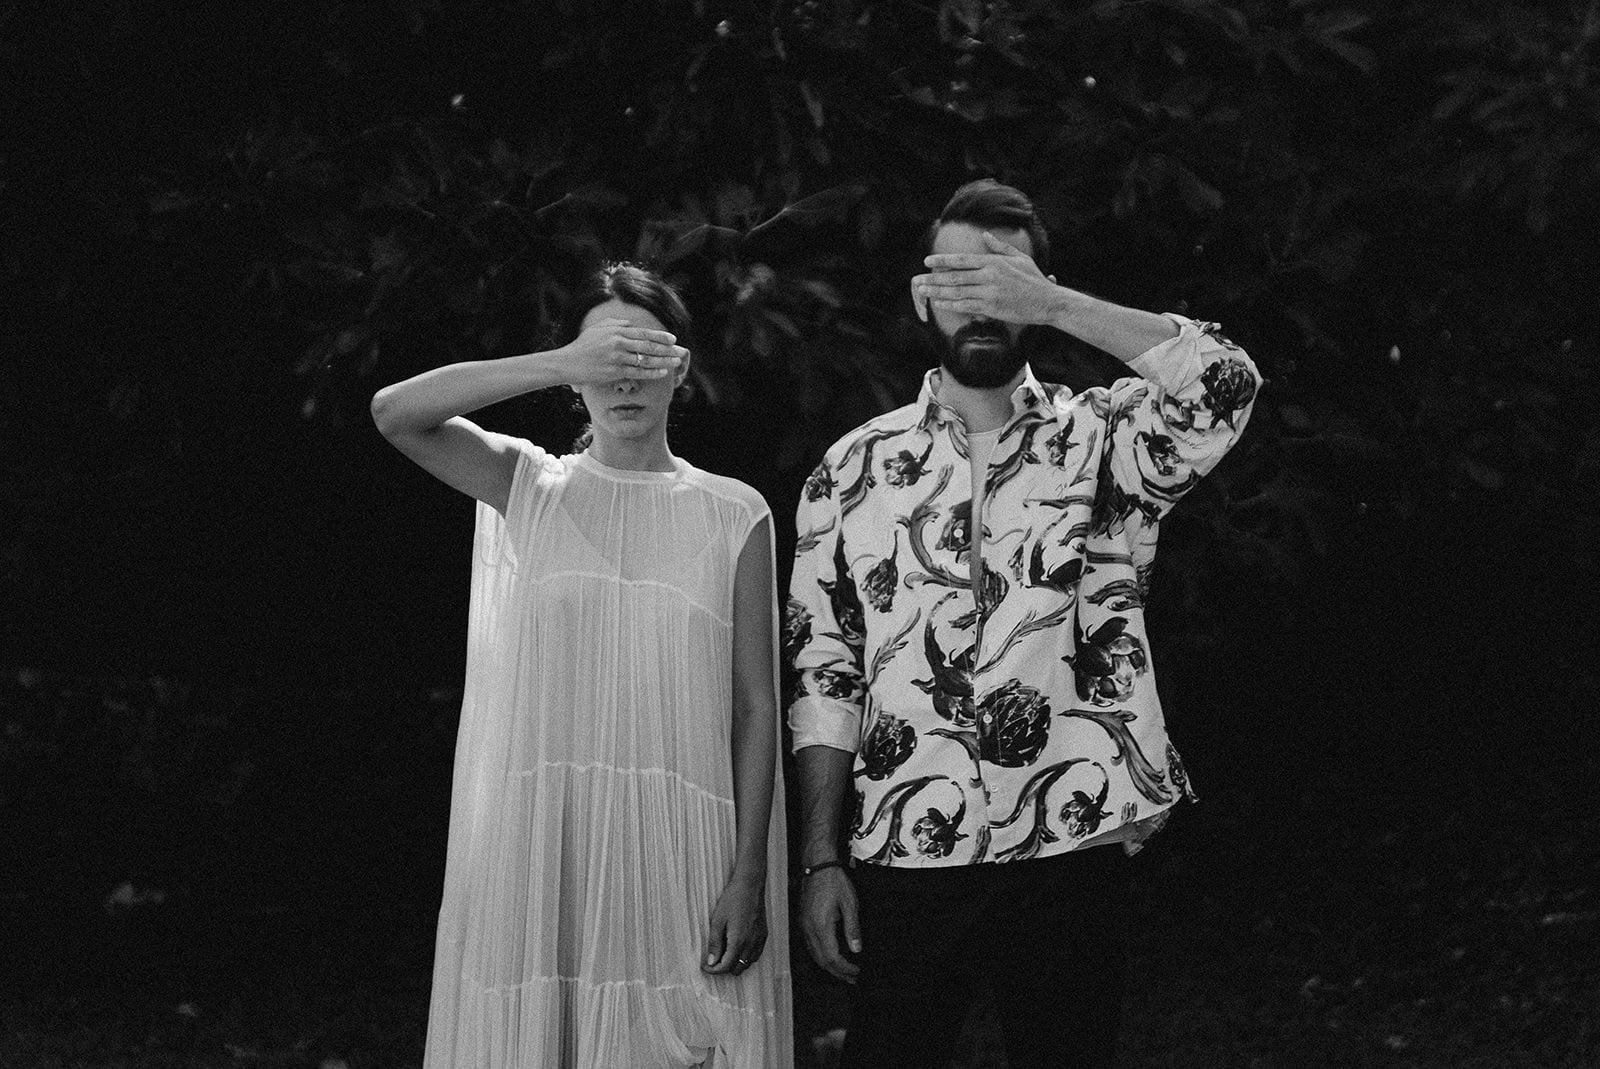 Alternative wedding videographer filming an artistic couple for a fine art wedding film